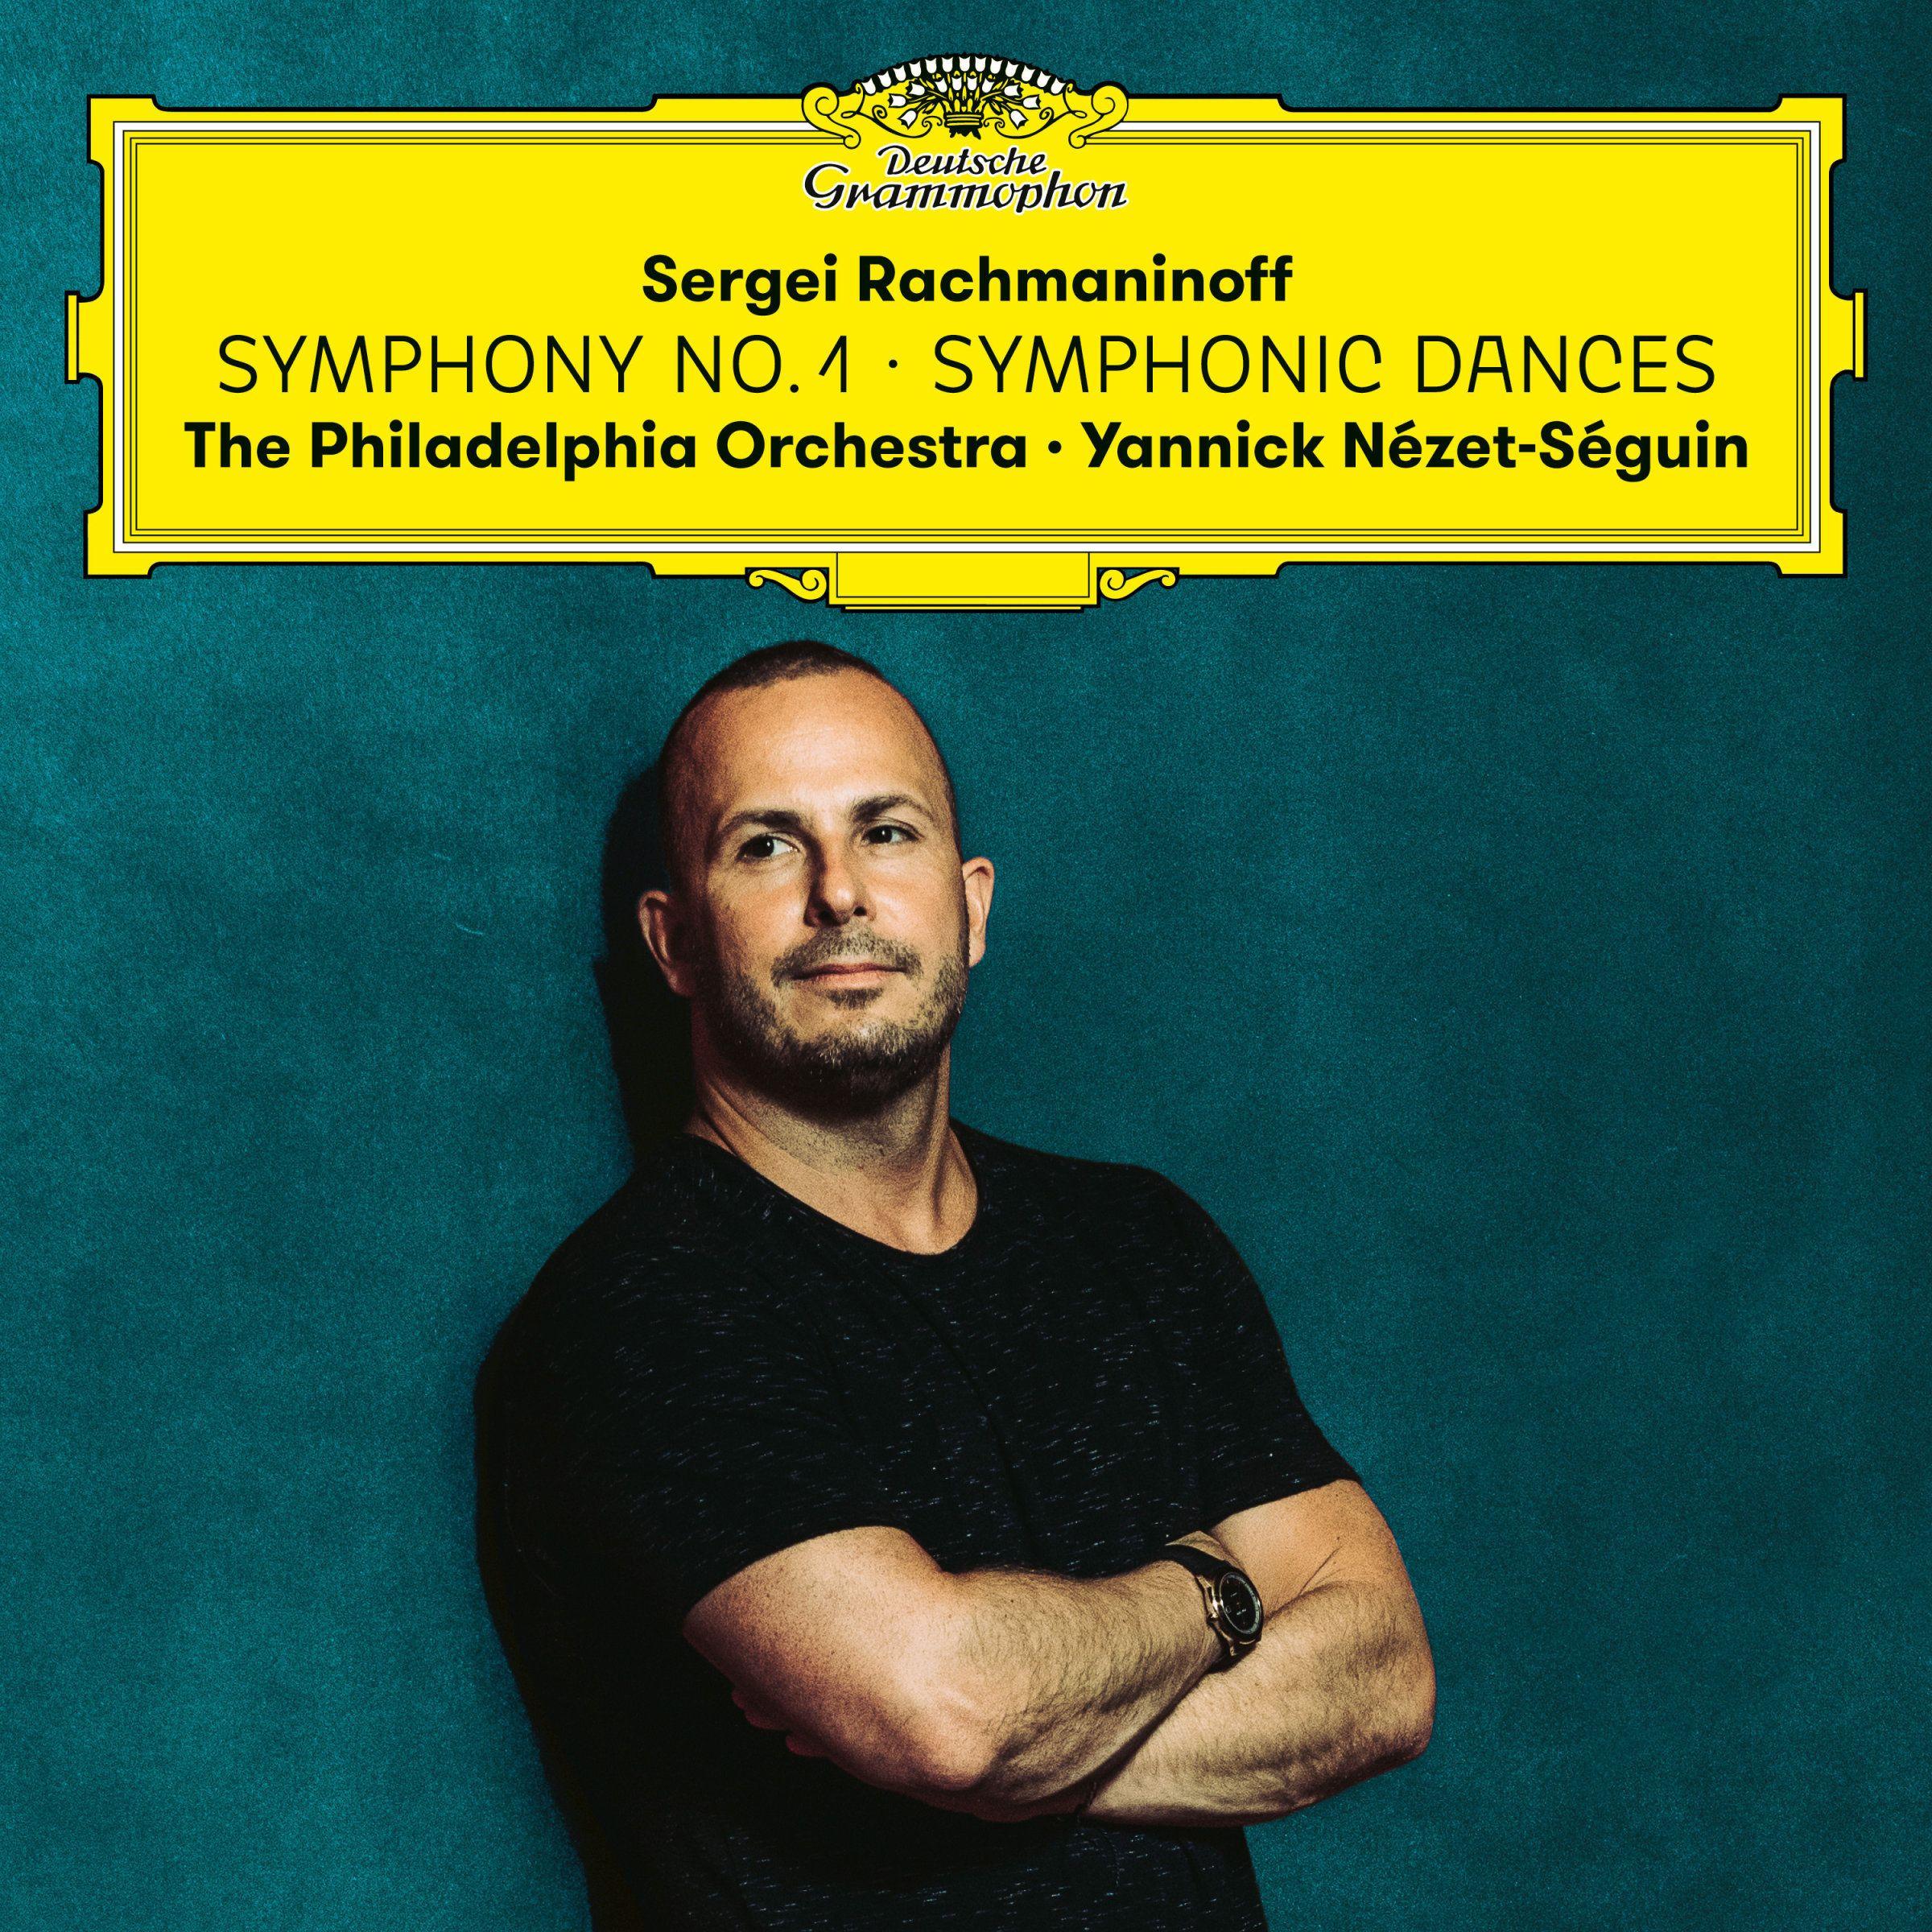 Sergei Rachmaninoff: «Symphony No. 1, Symphonic Dances»